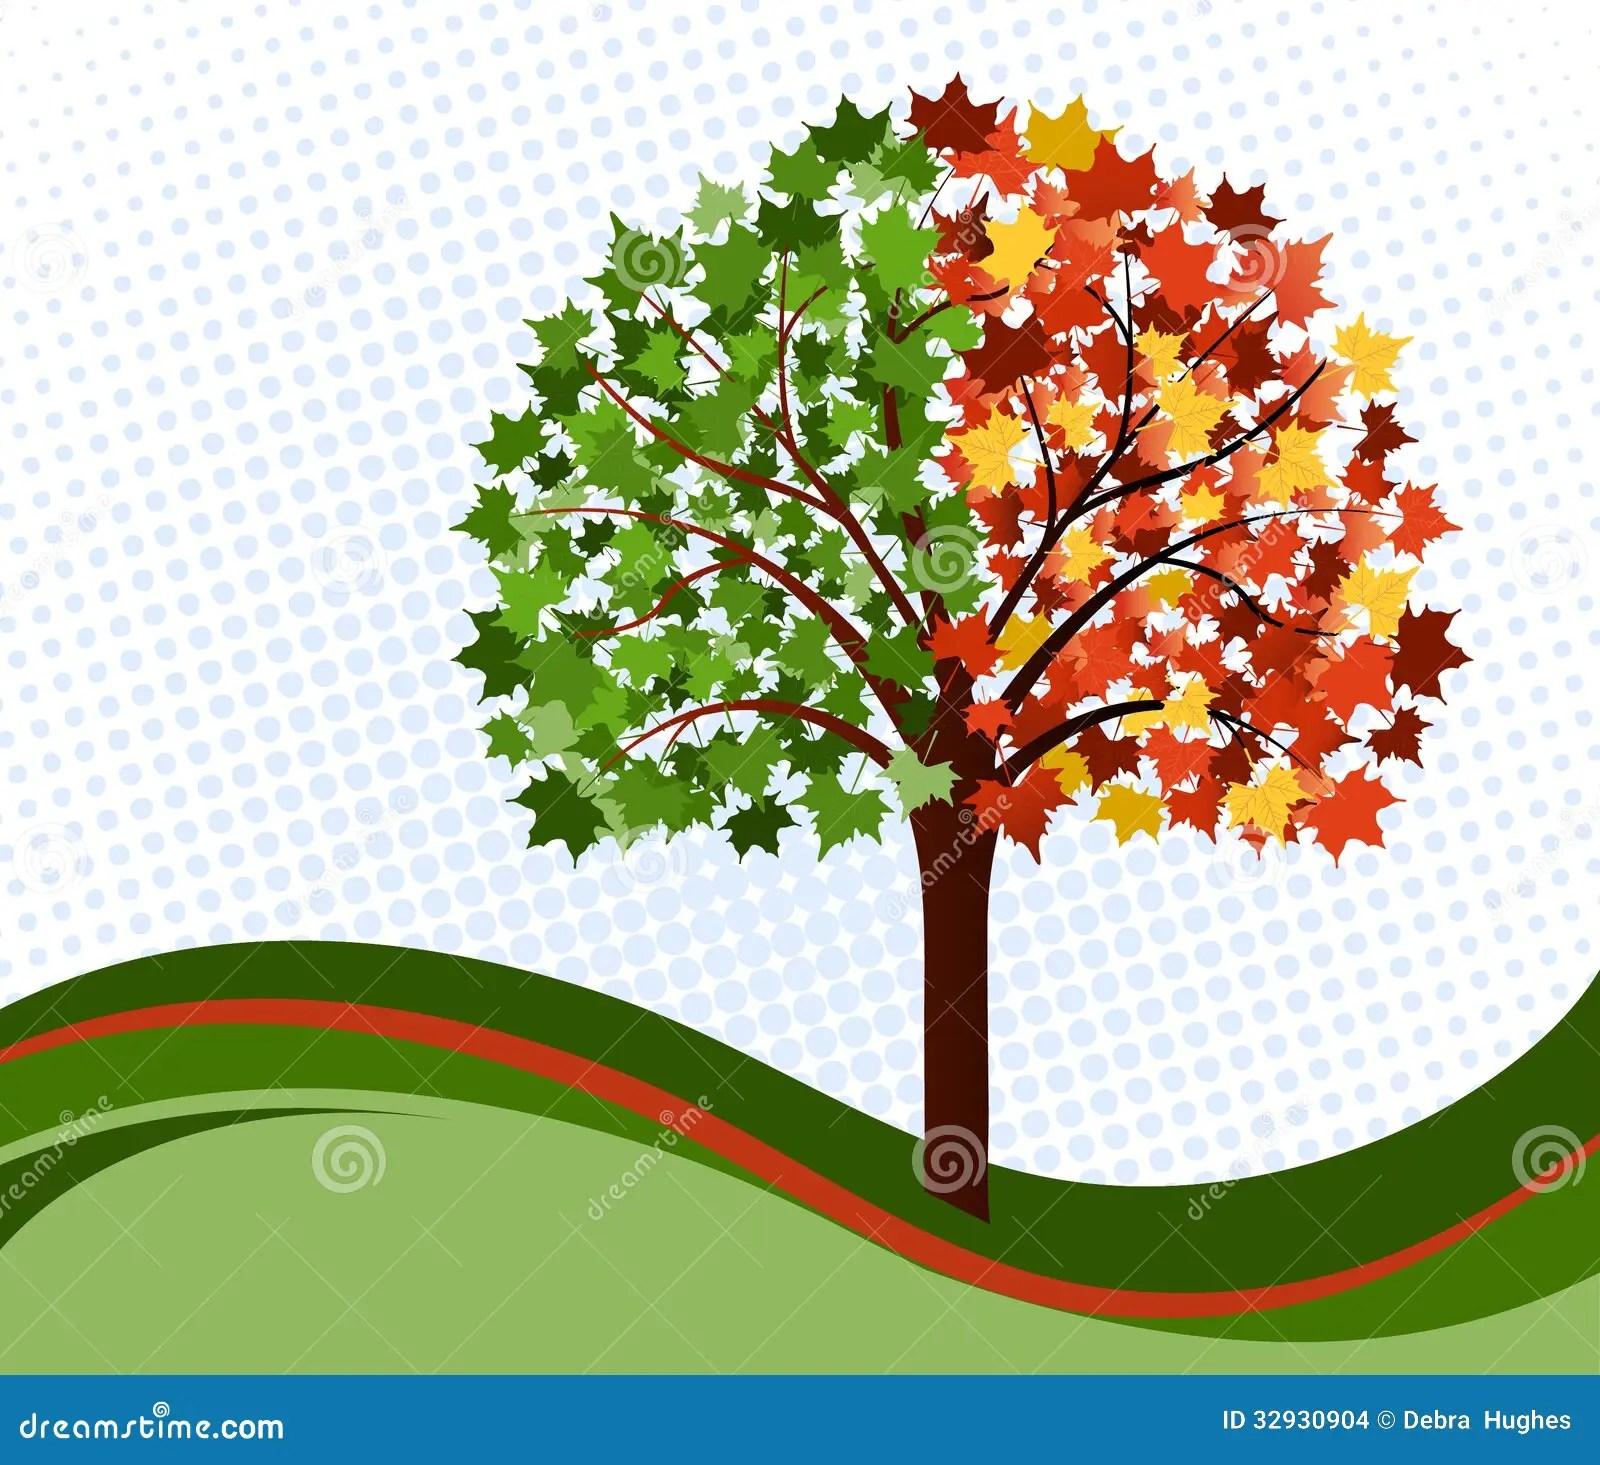 Changing Seasons Tree Stock Images